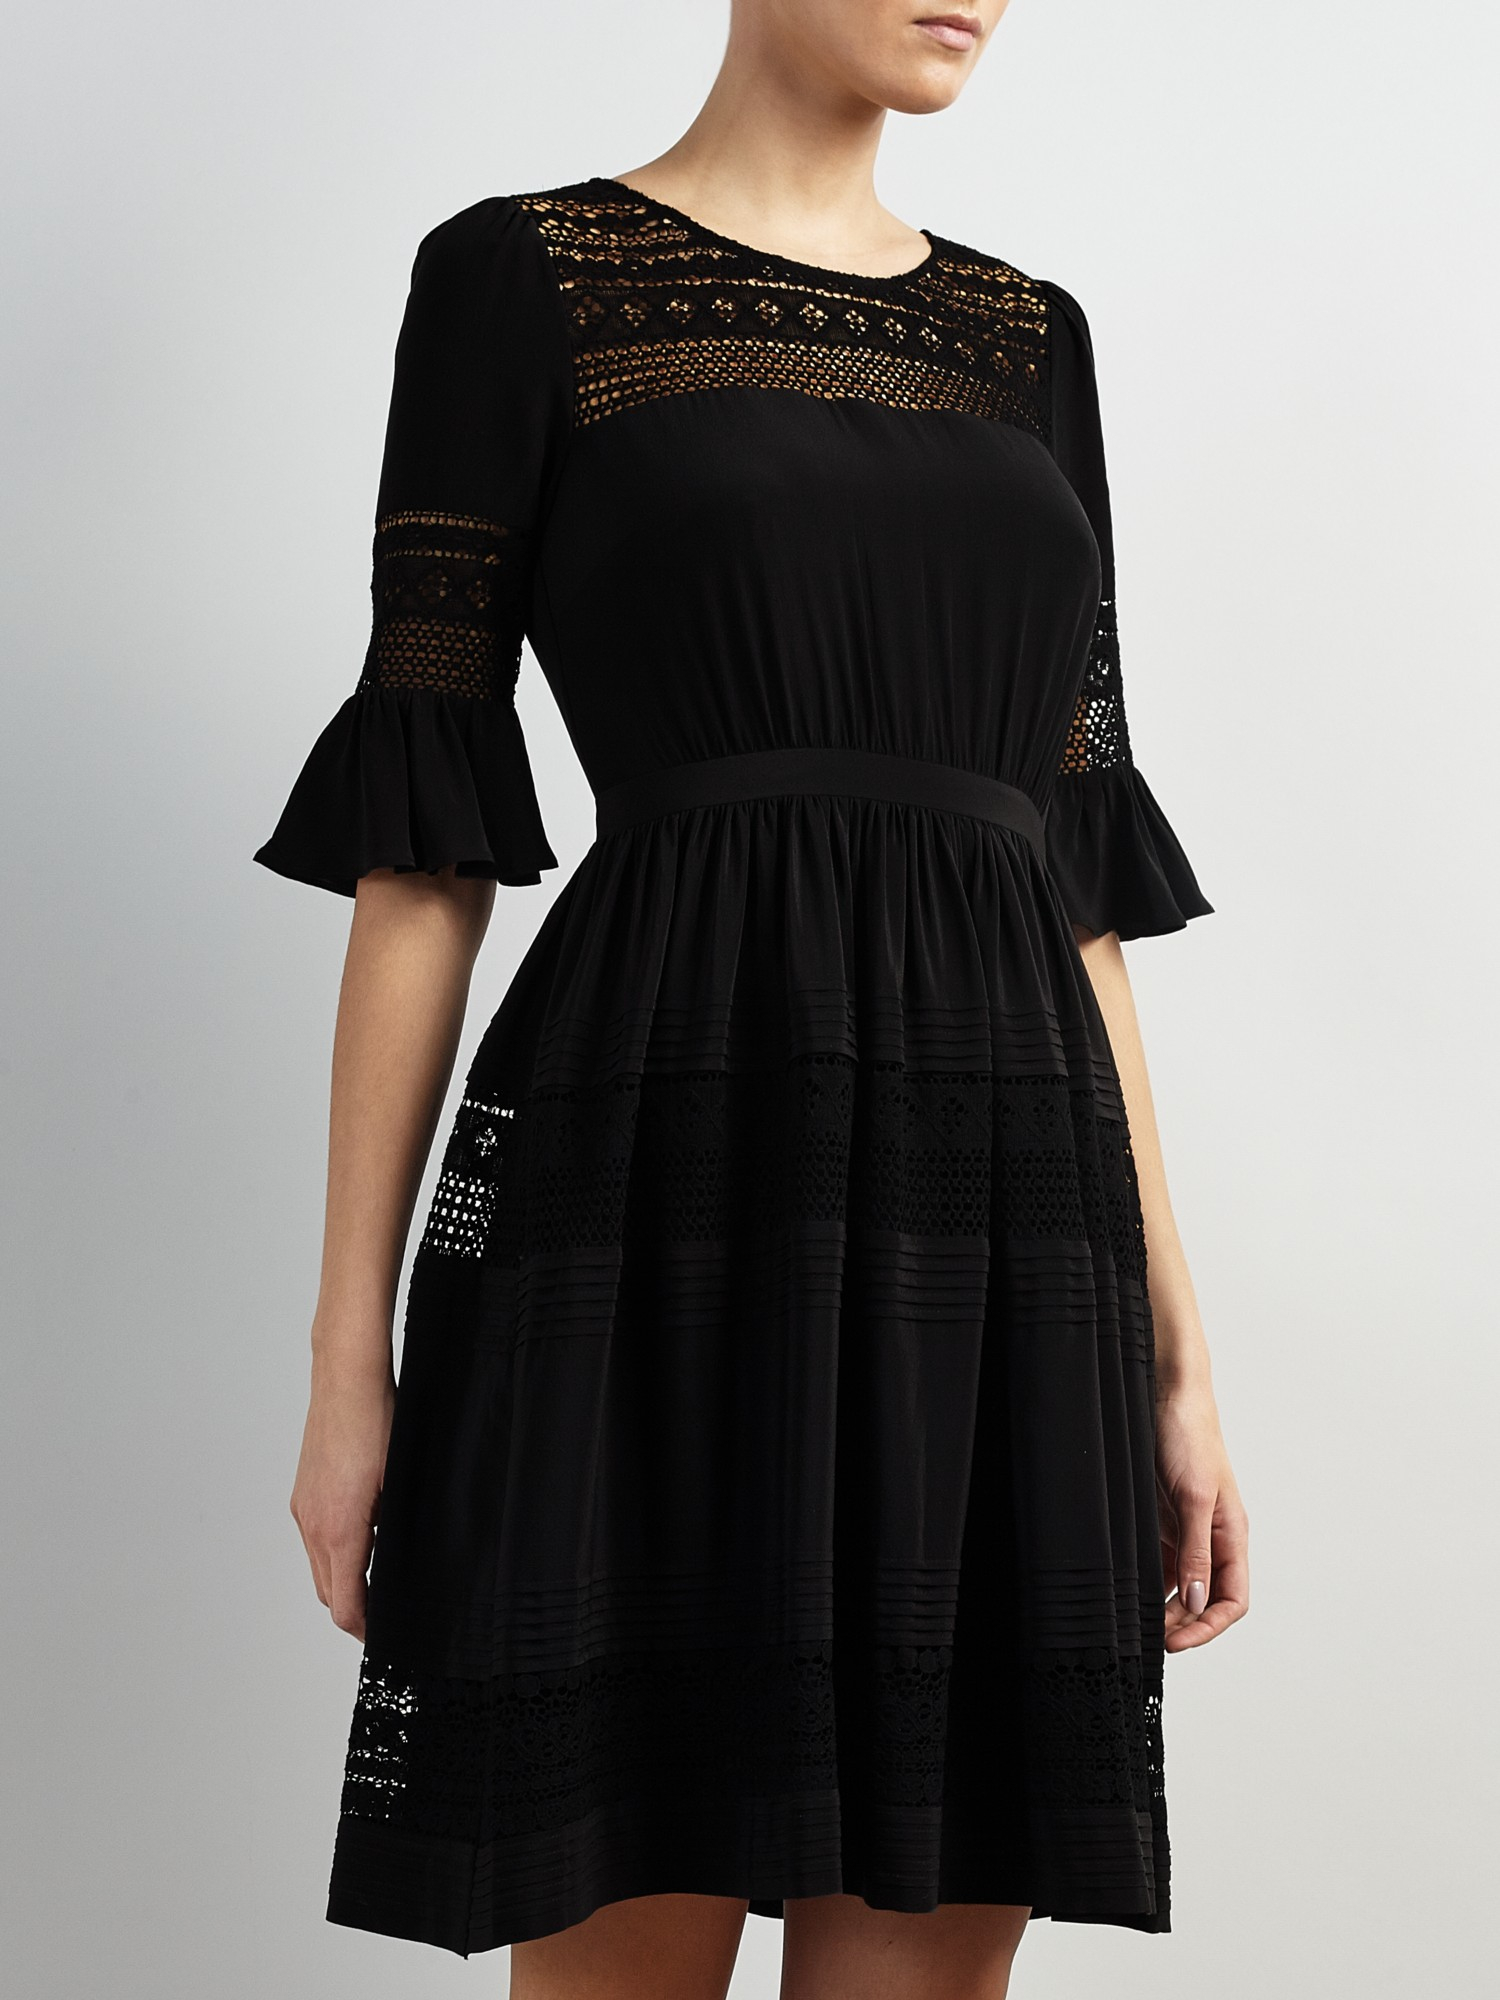 Somerset By Alice Temperley Lace Insert Dress In Black Lyst